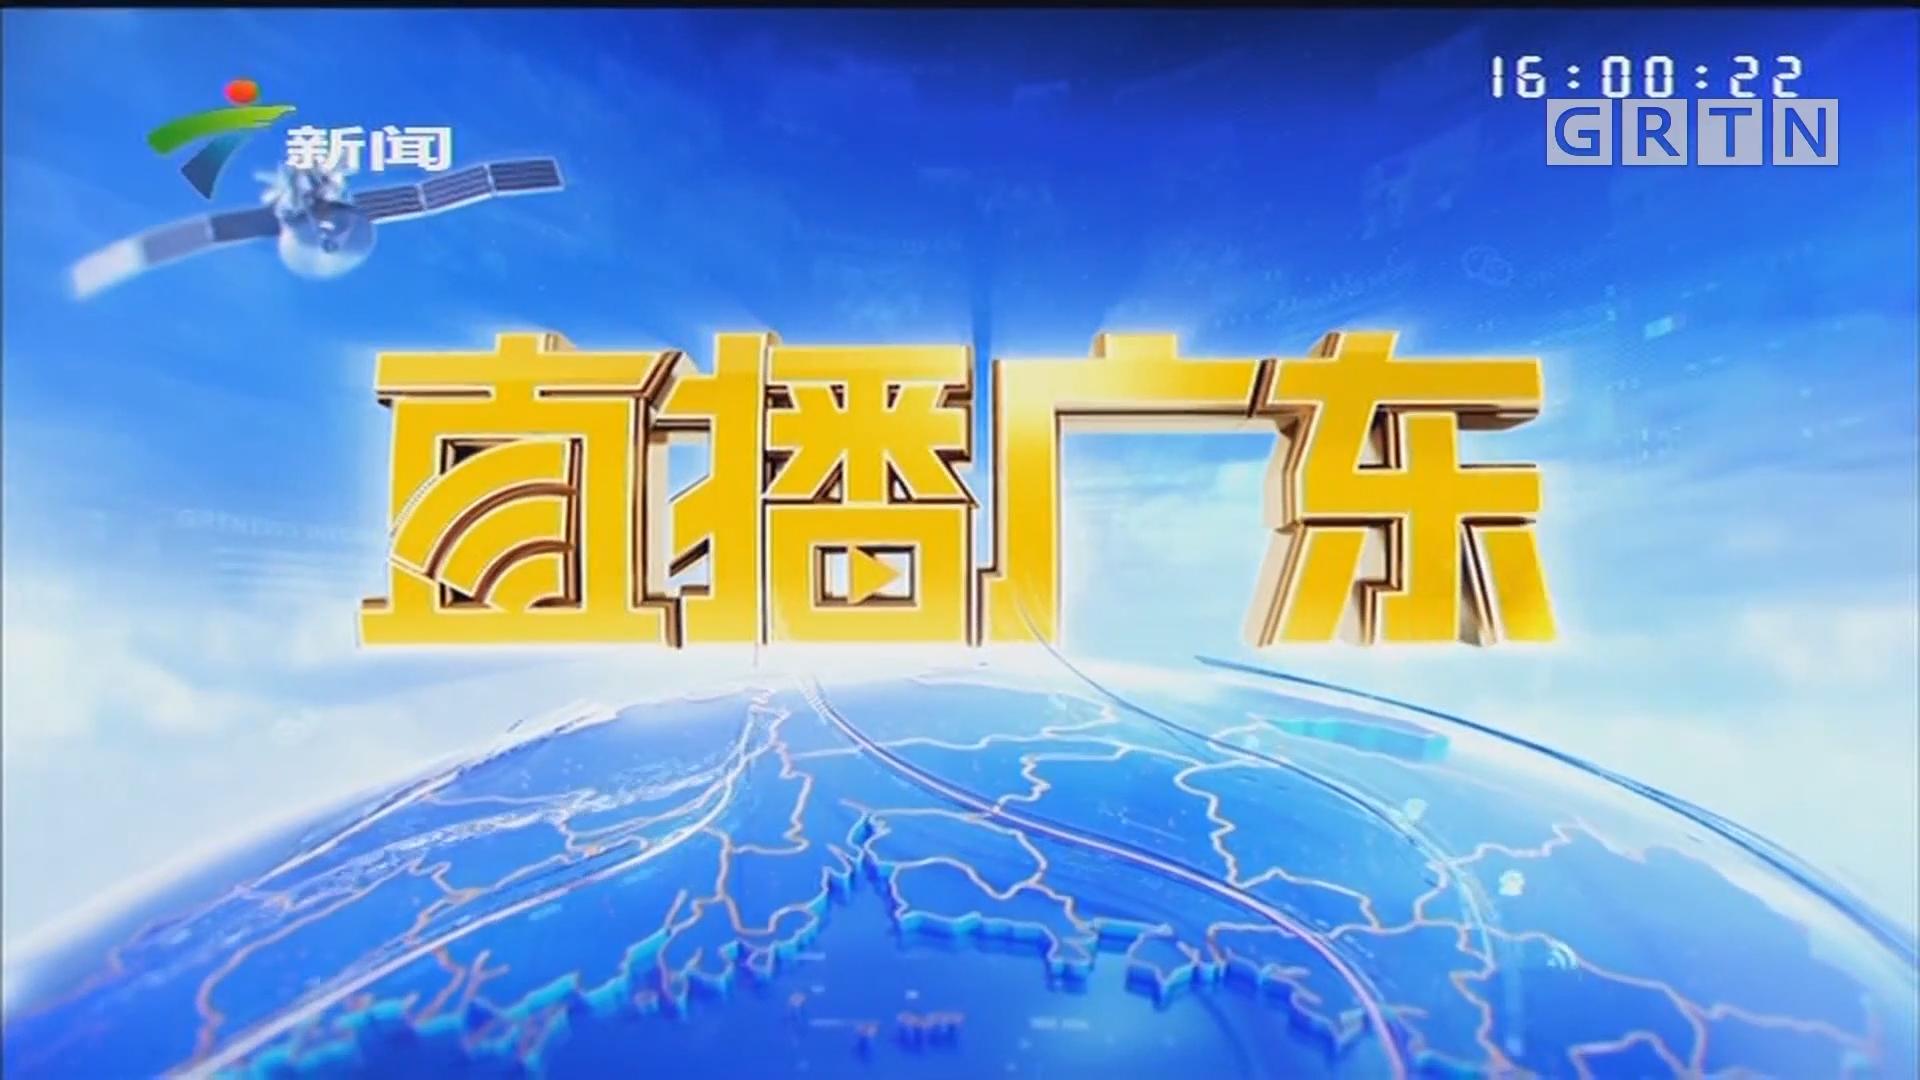 [HD][2019-06-11]直播manbetx手机版 - 登陆:河源:特大暴雨袭击 当地积极抗汛救灾